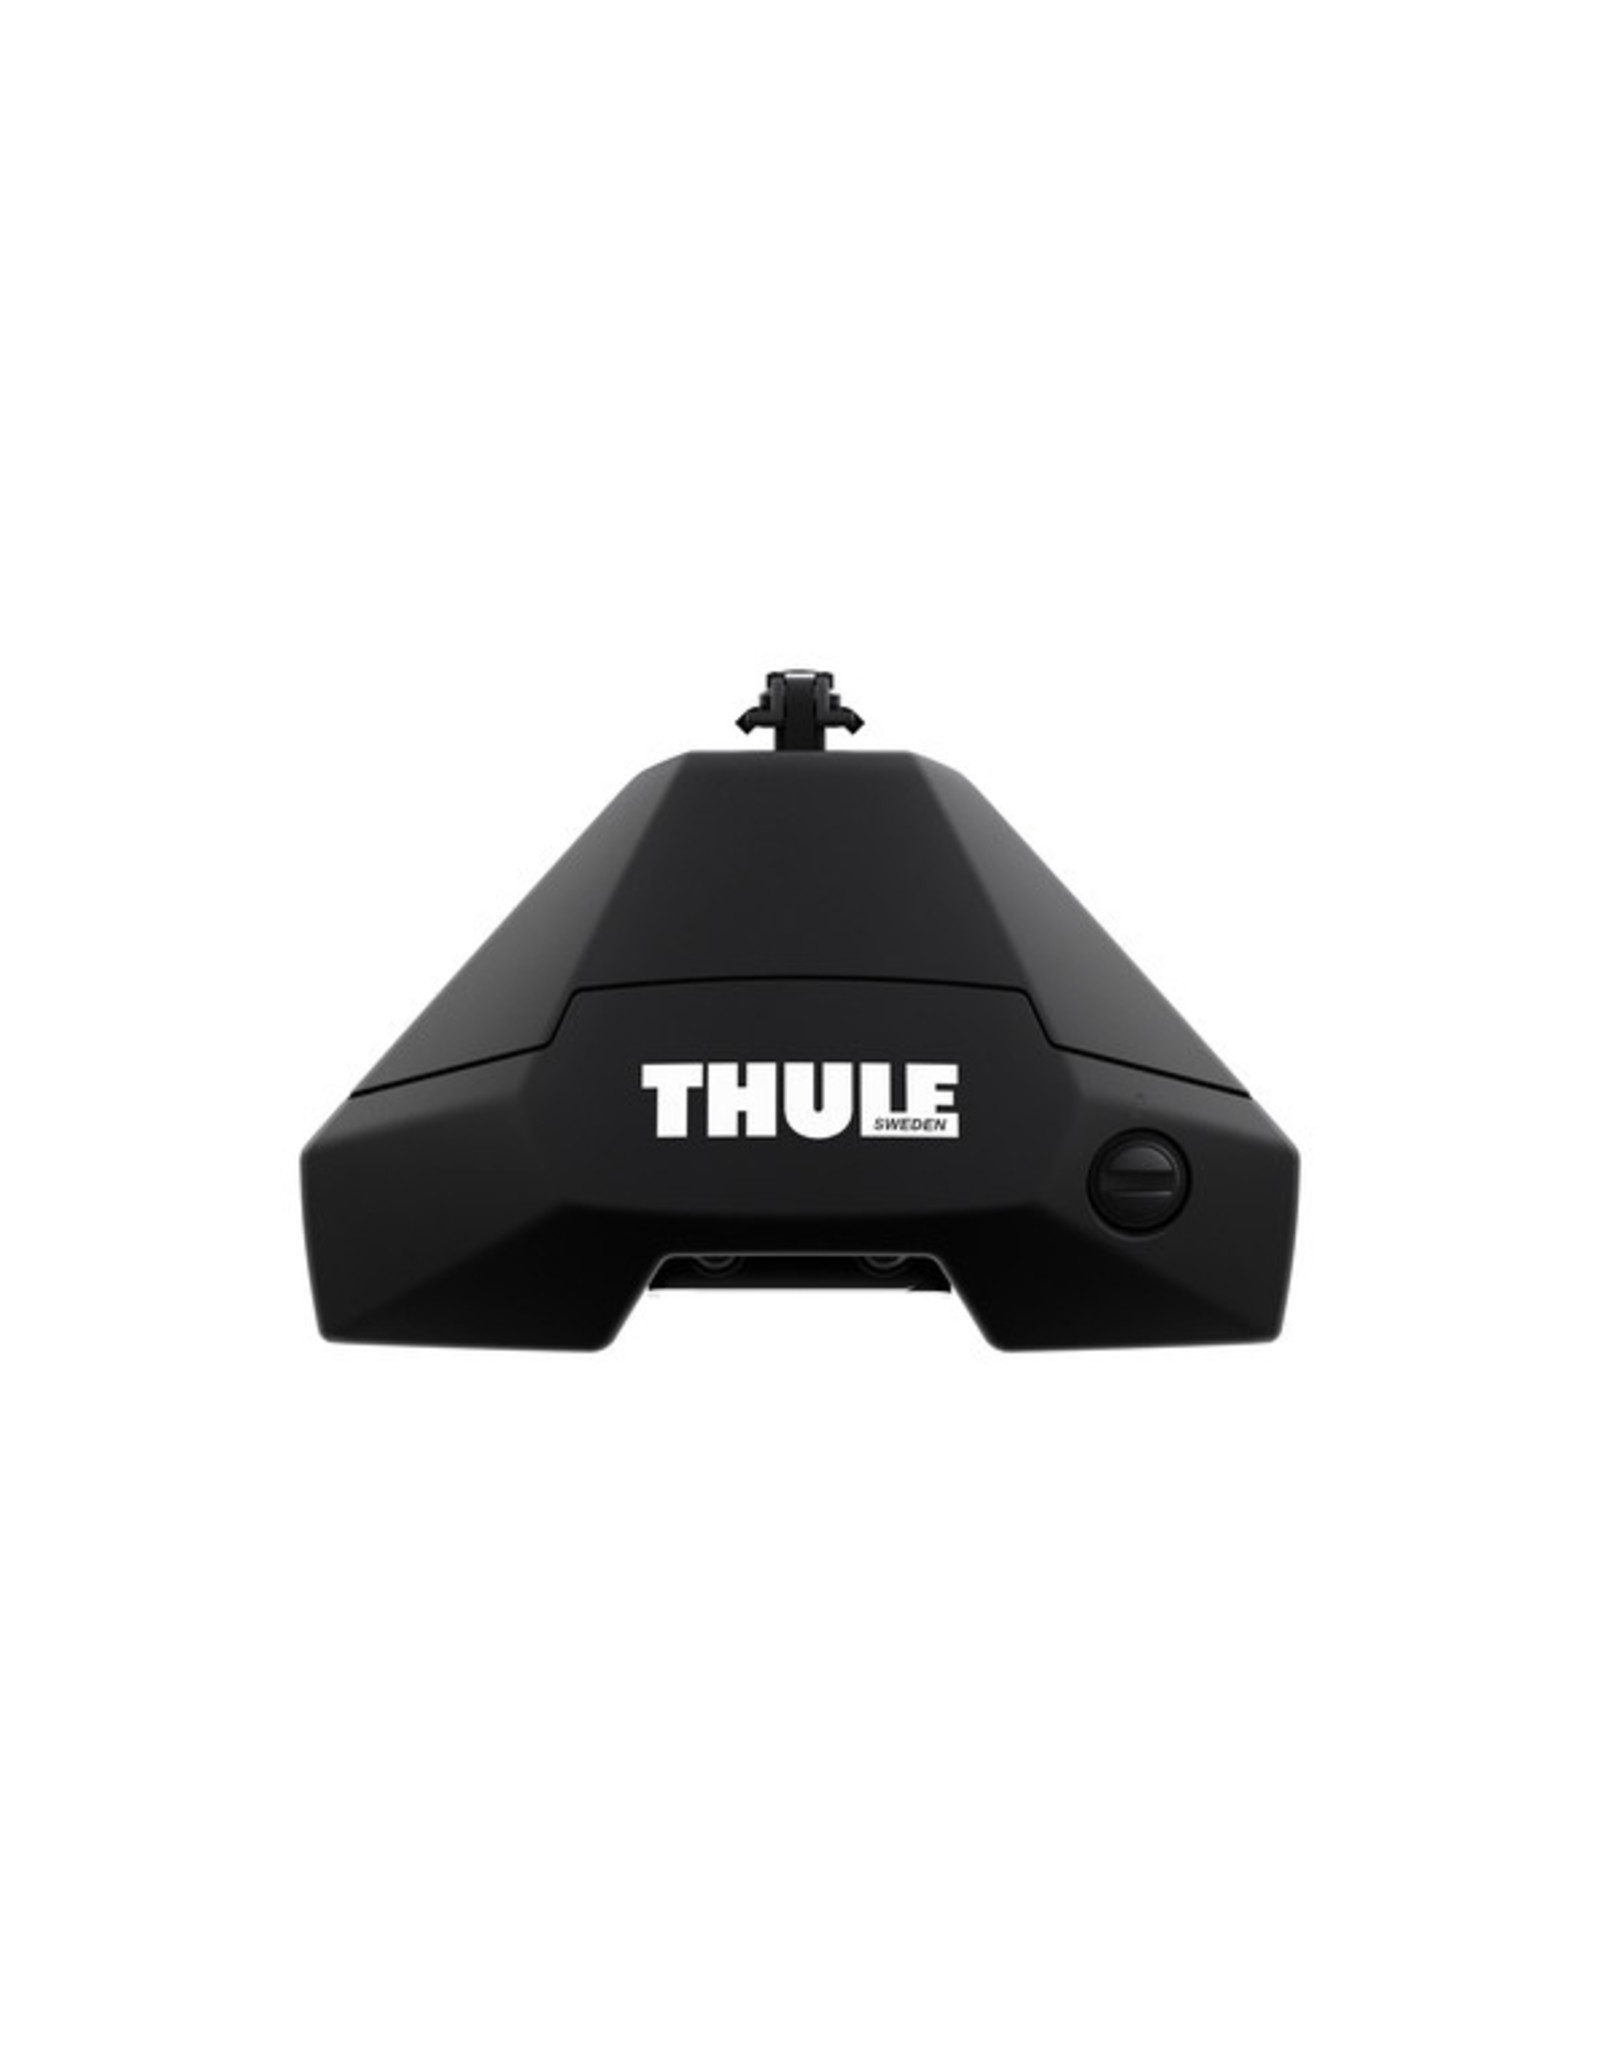 Thule Evo Clamp Thule